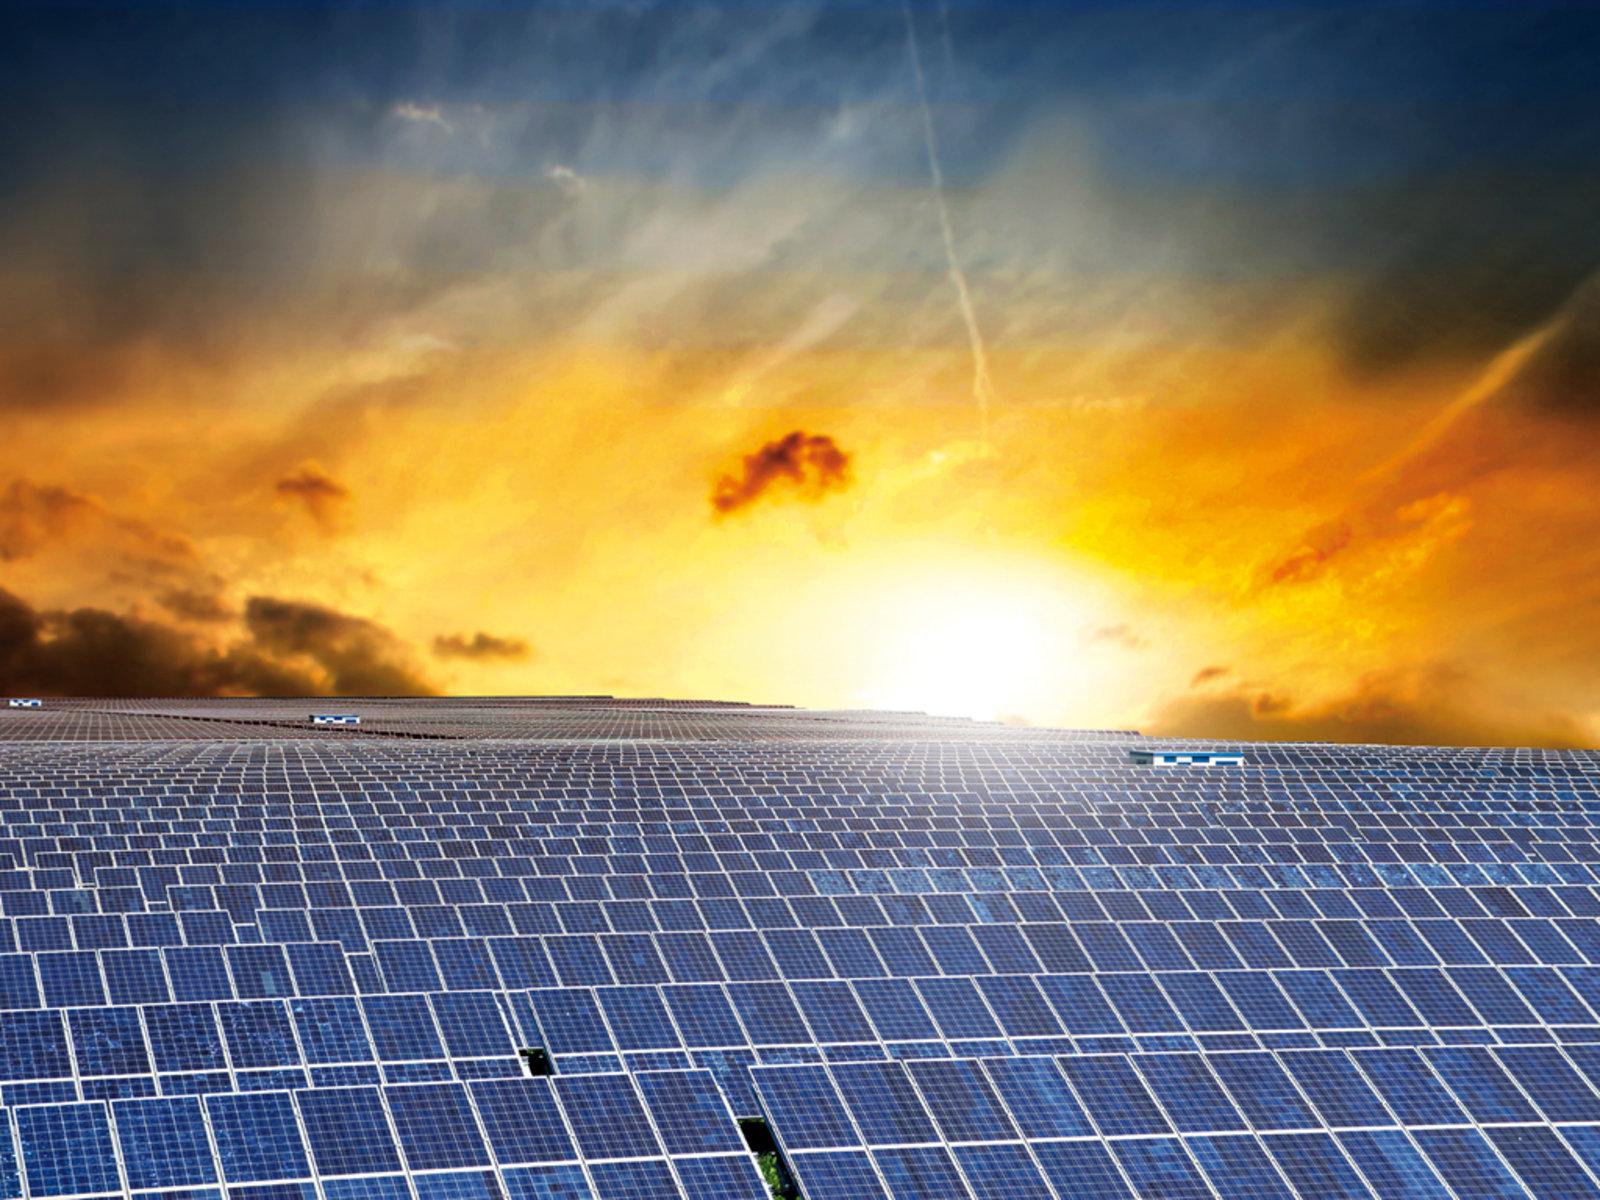 fotovoltaico 2016